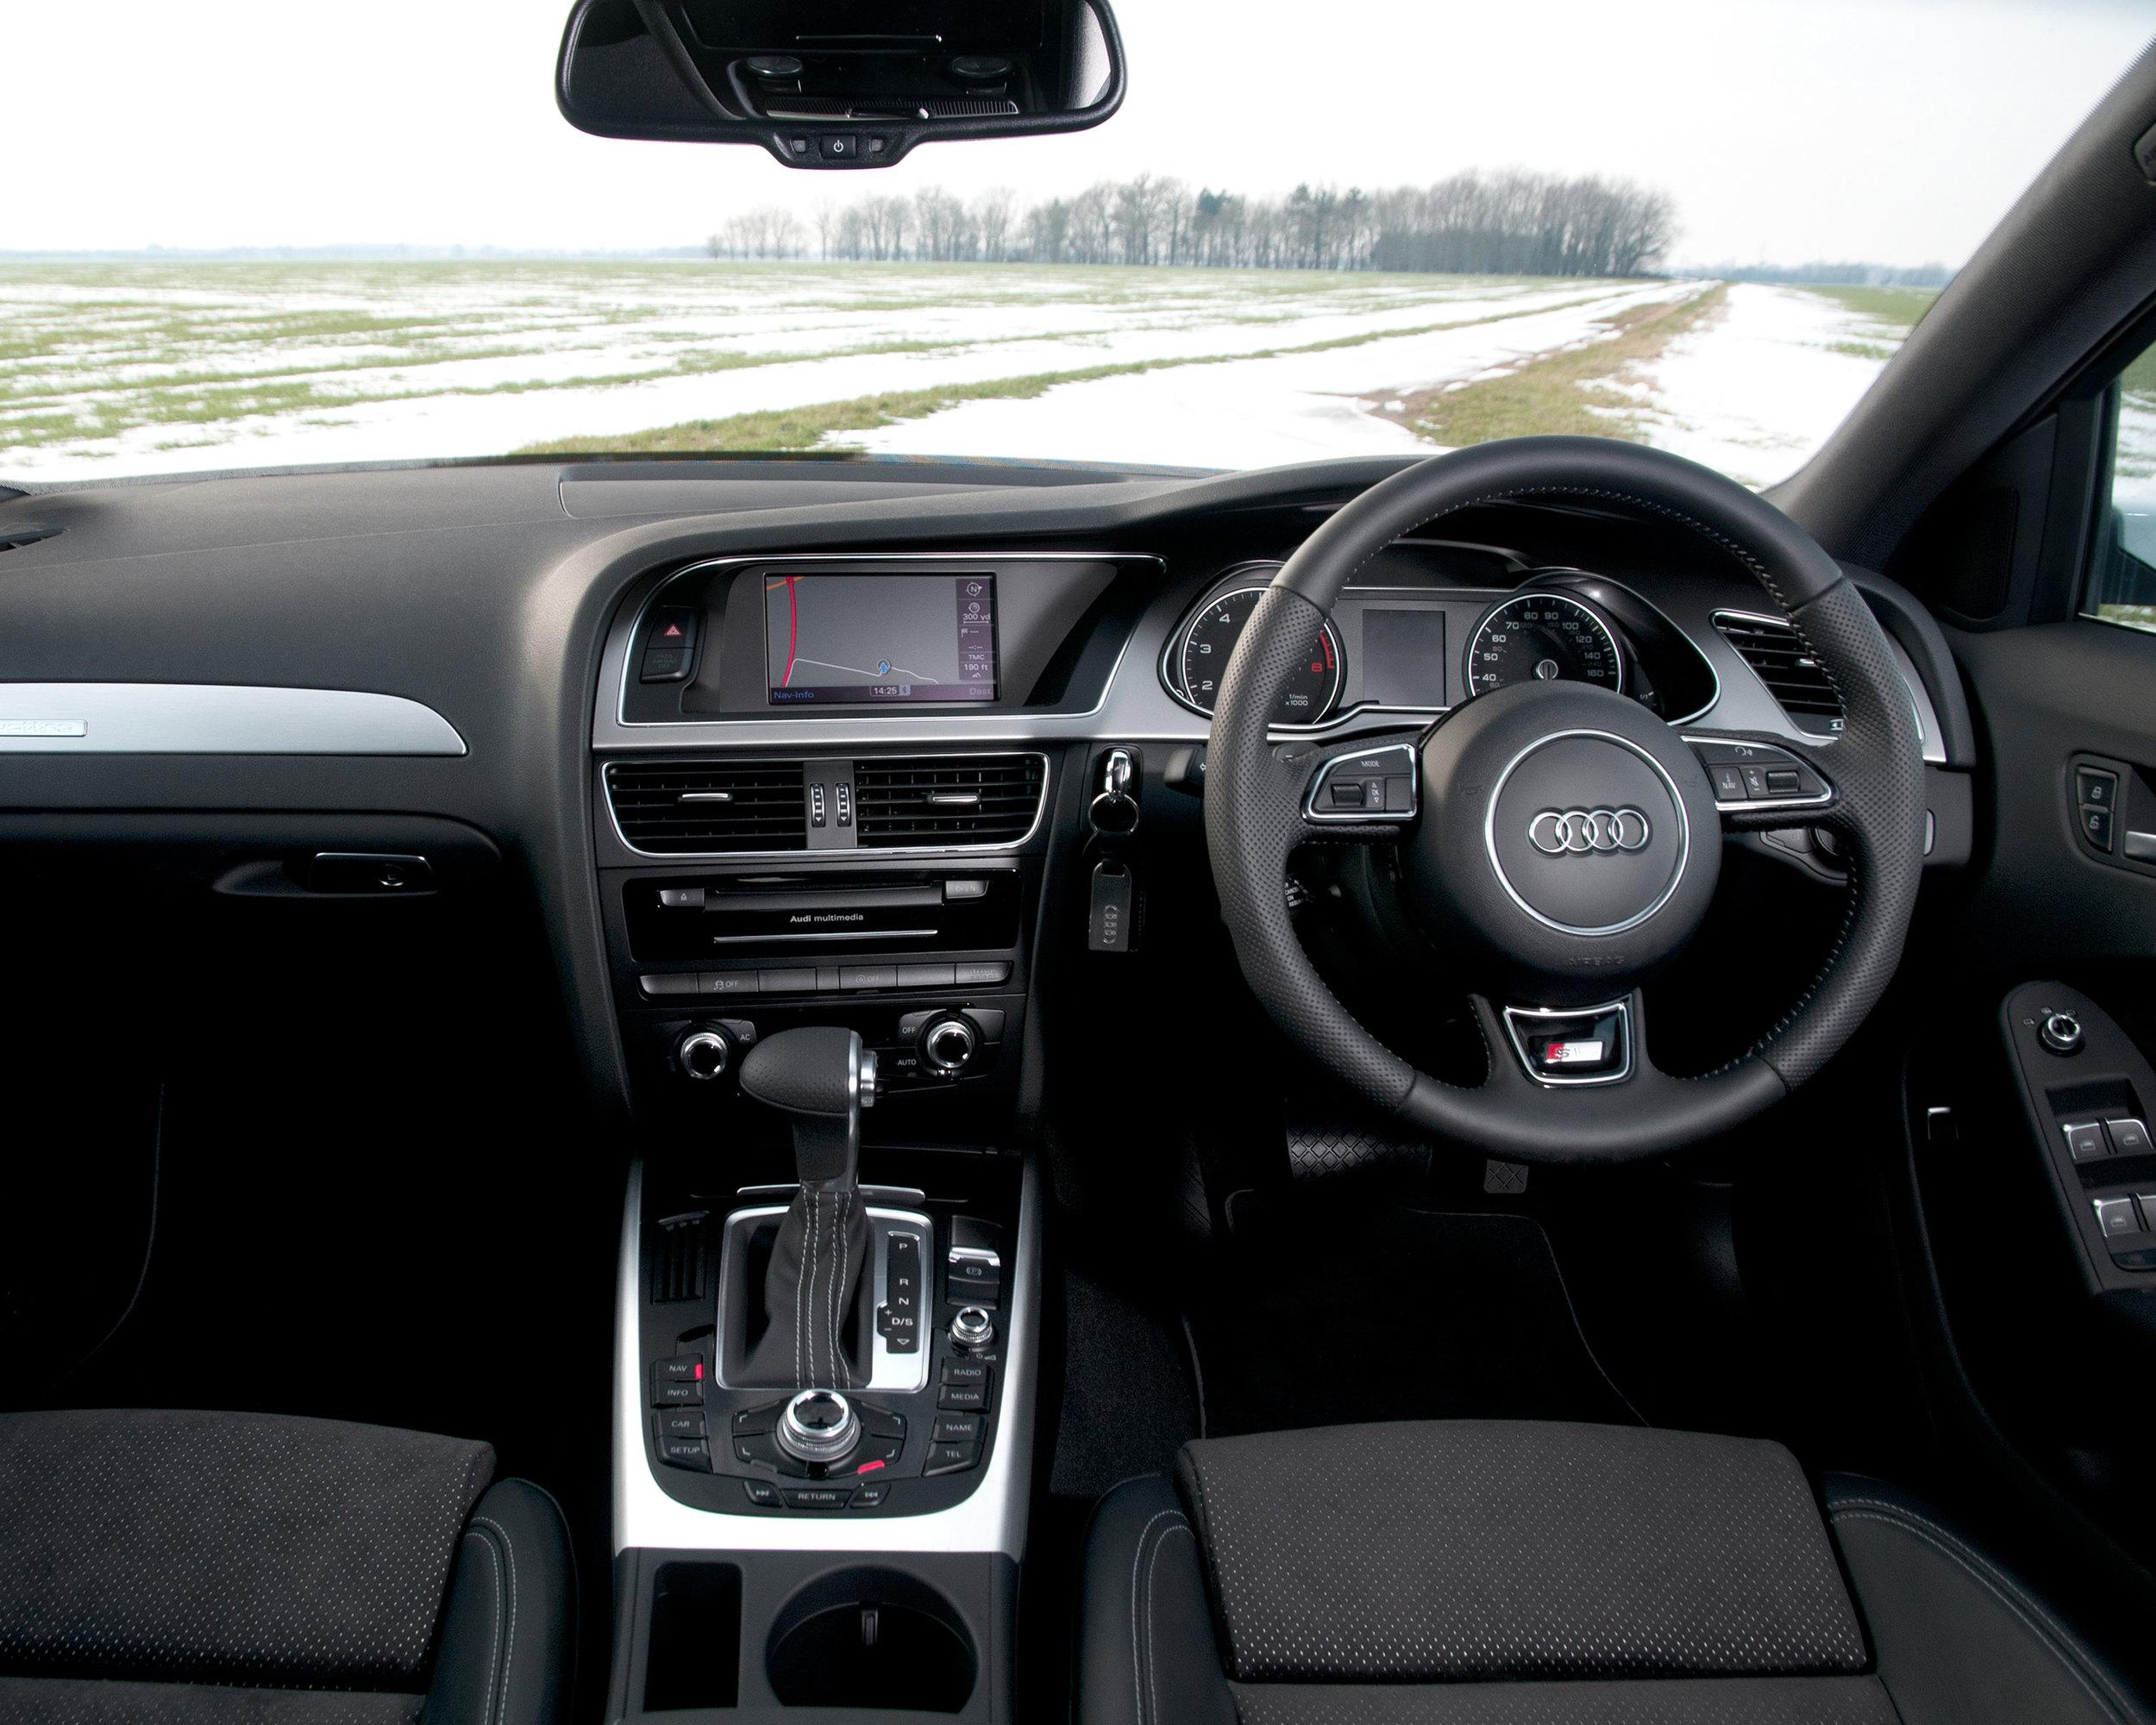 Audi A4 15.jpg